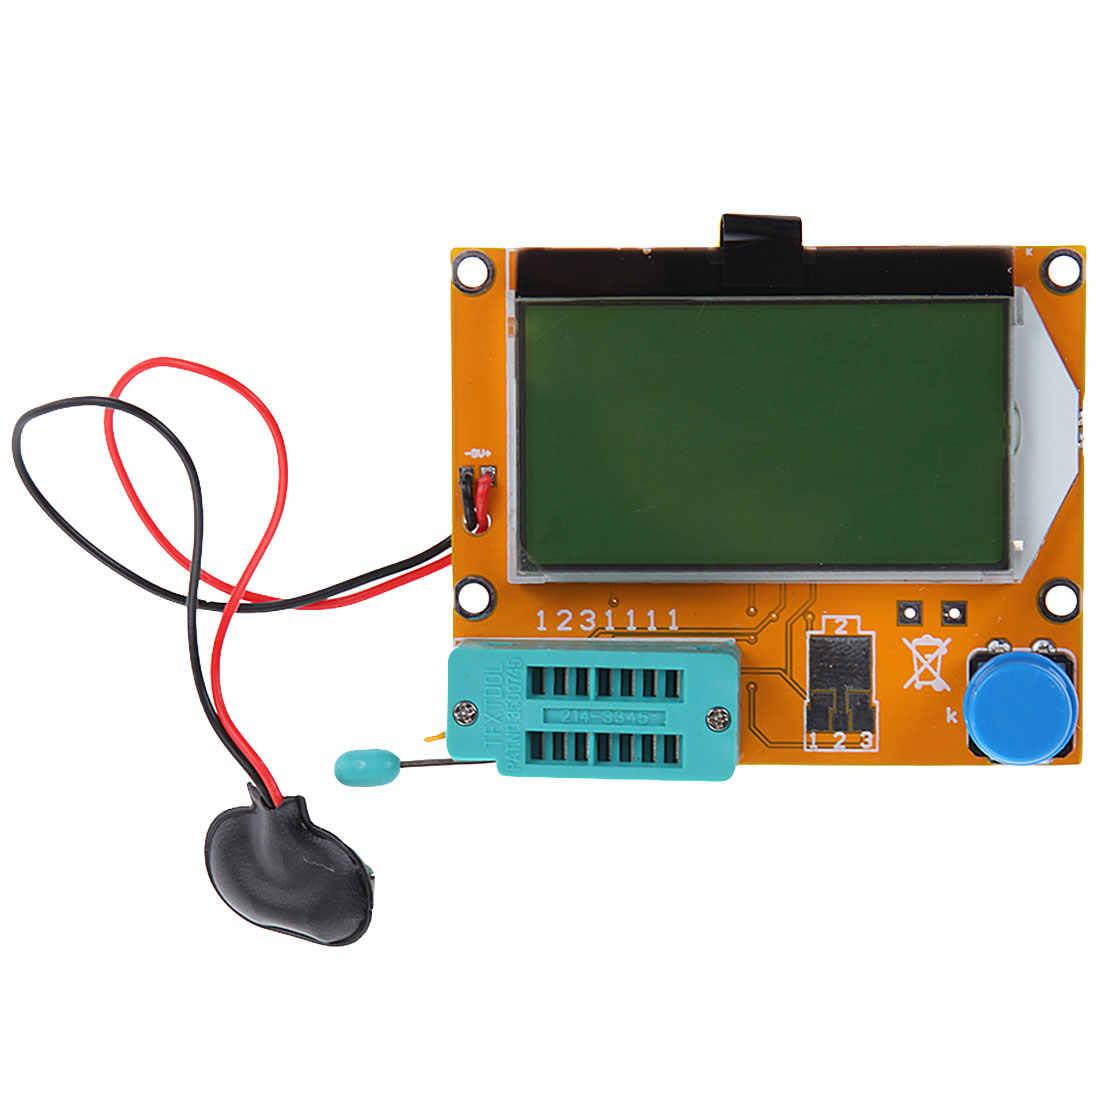 1 Pcs Transistor Tester Digital V2.68 ESR-T4 Dioda Triode Kapasitansi untuk MOS/PNP/NPN LCR 12864 LCD Layar tester ESR Meter